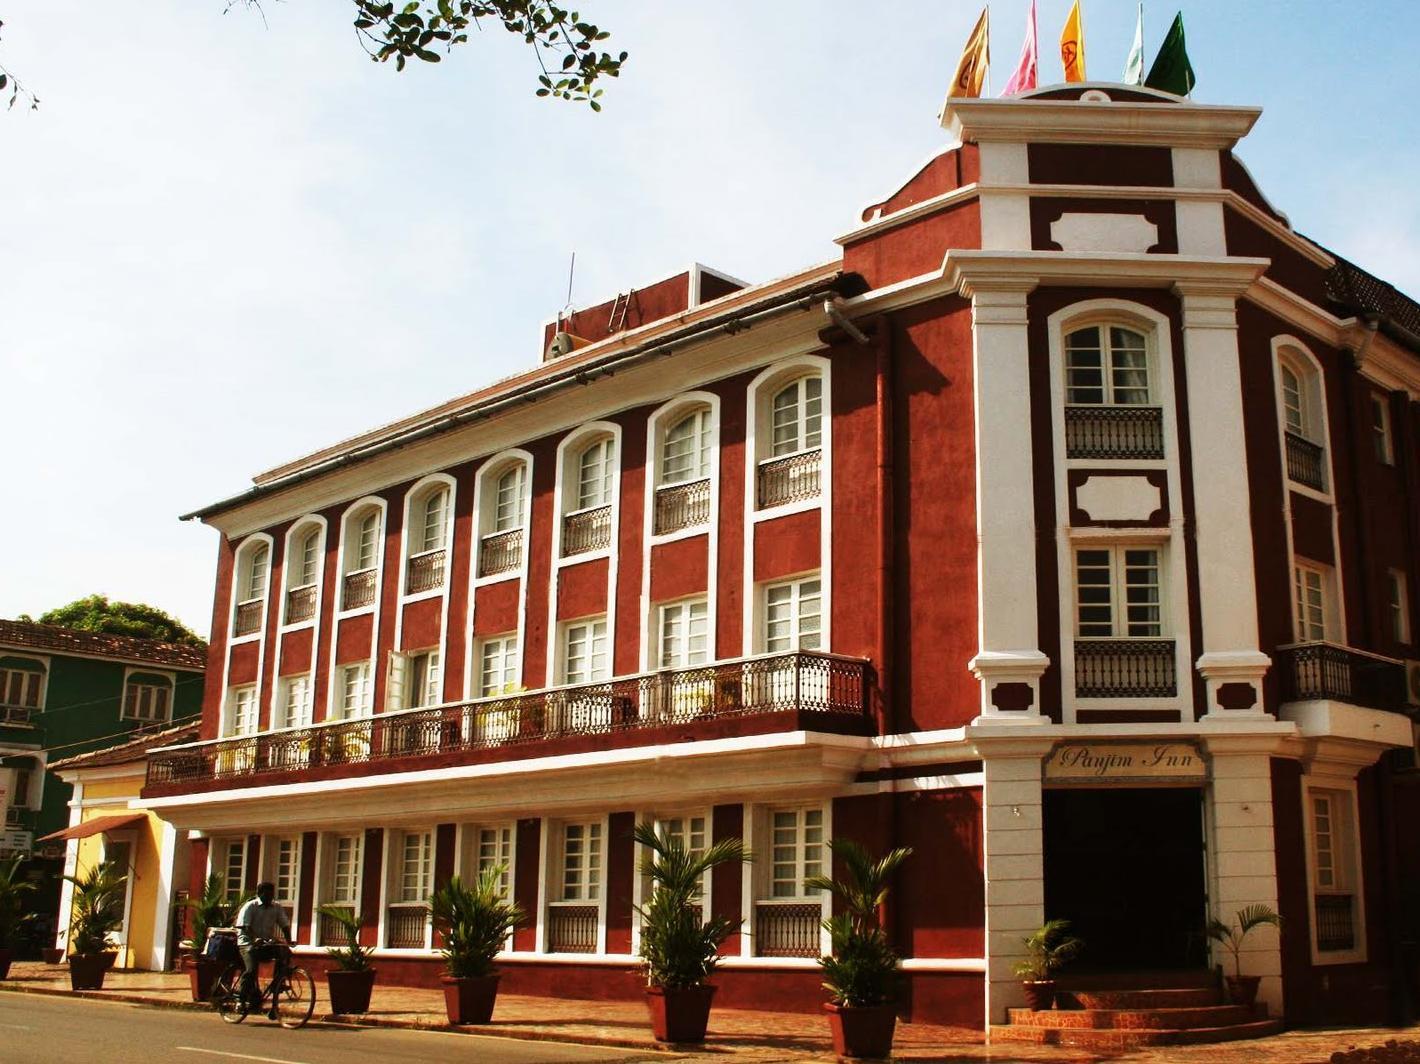 Panjim Inn Hotel